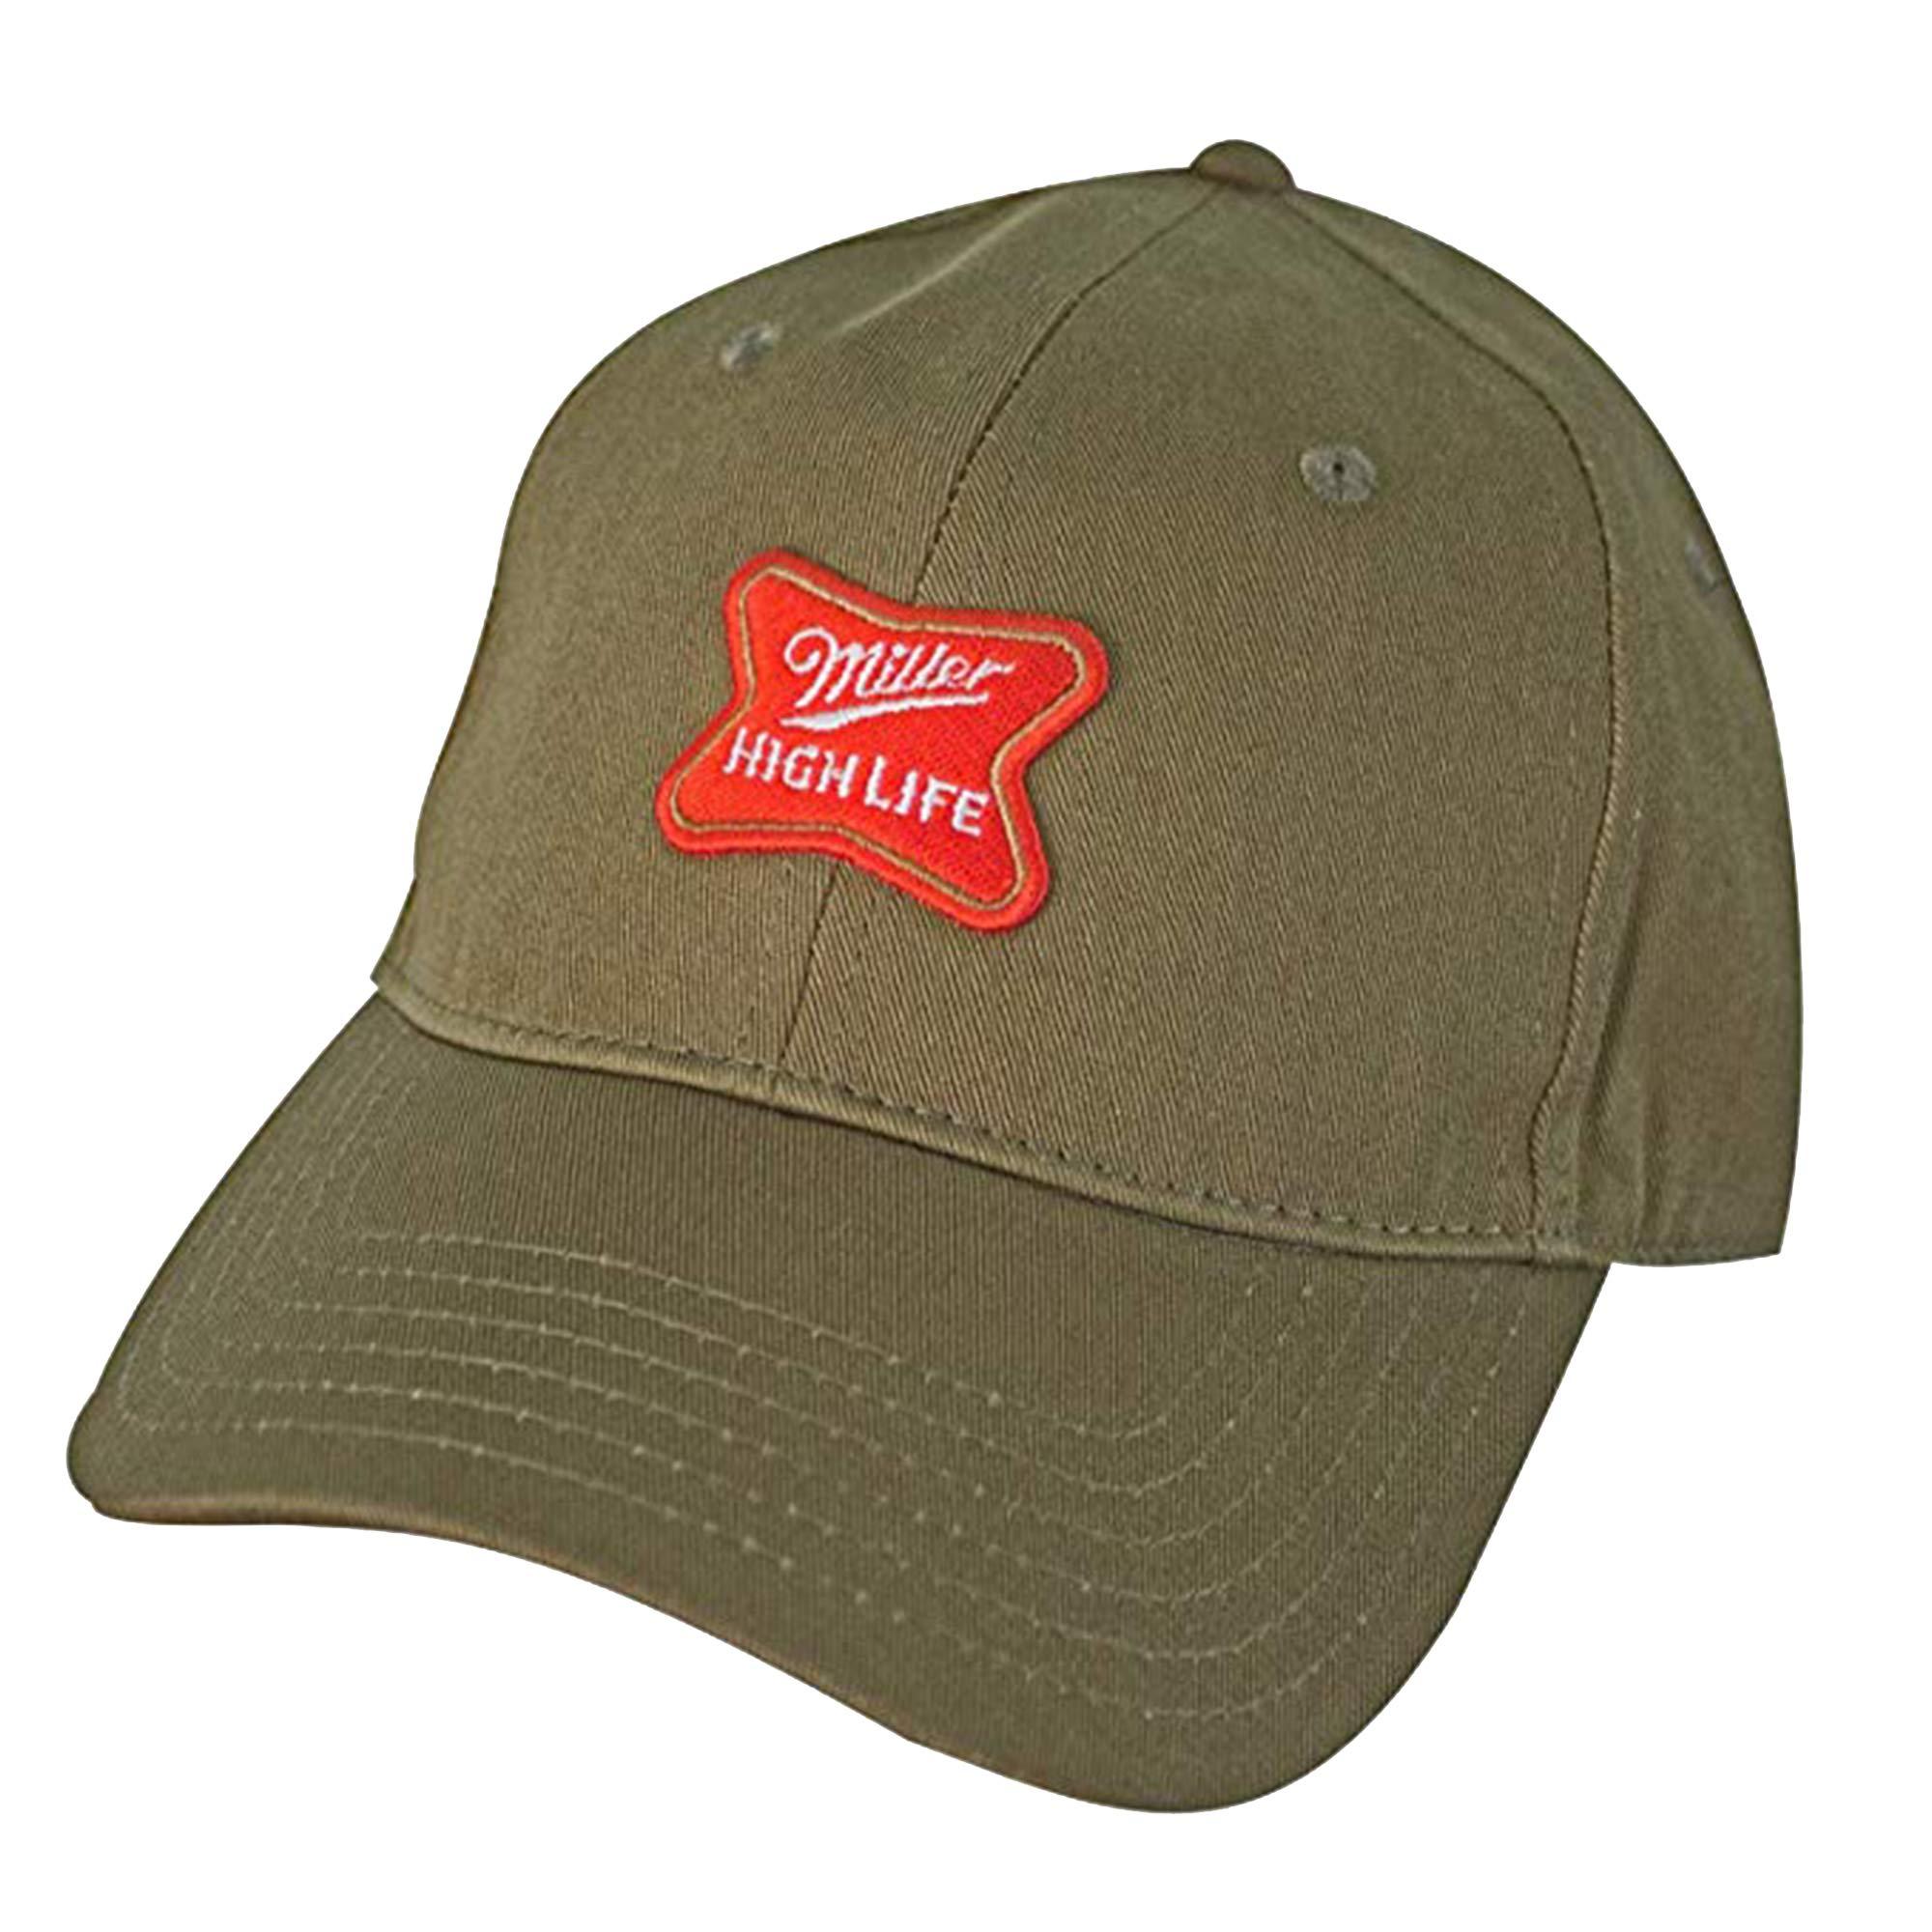 Miller H3 运动装备高寿命标志军帽